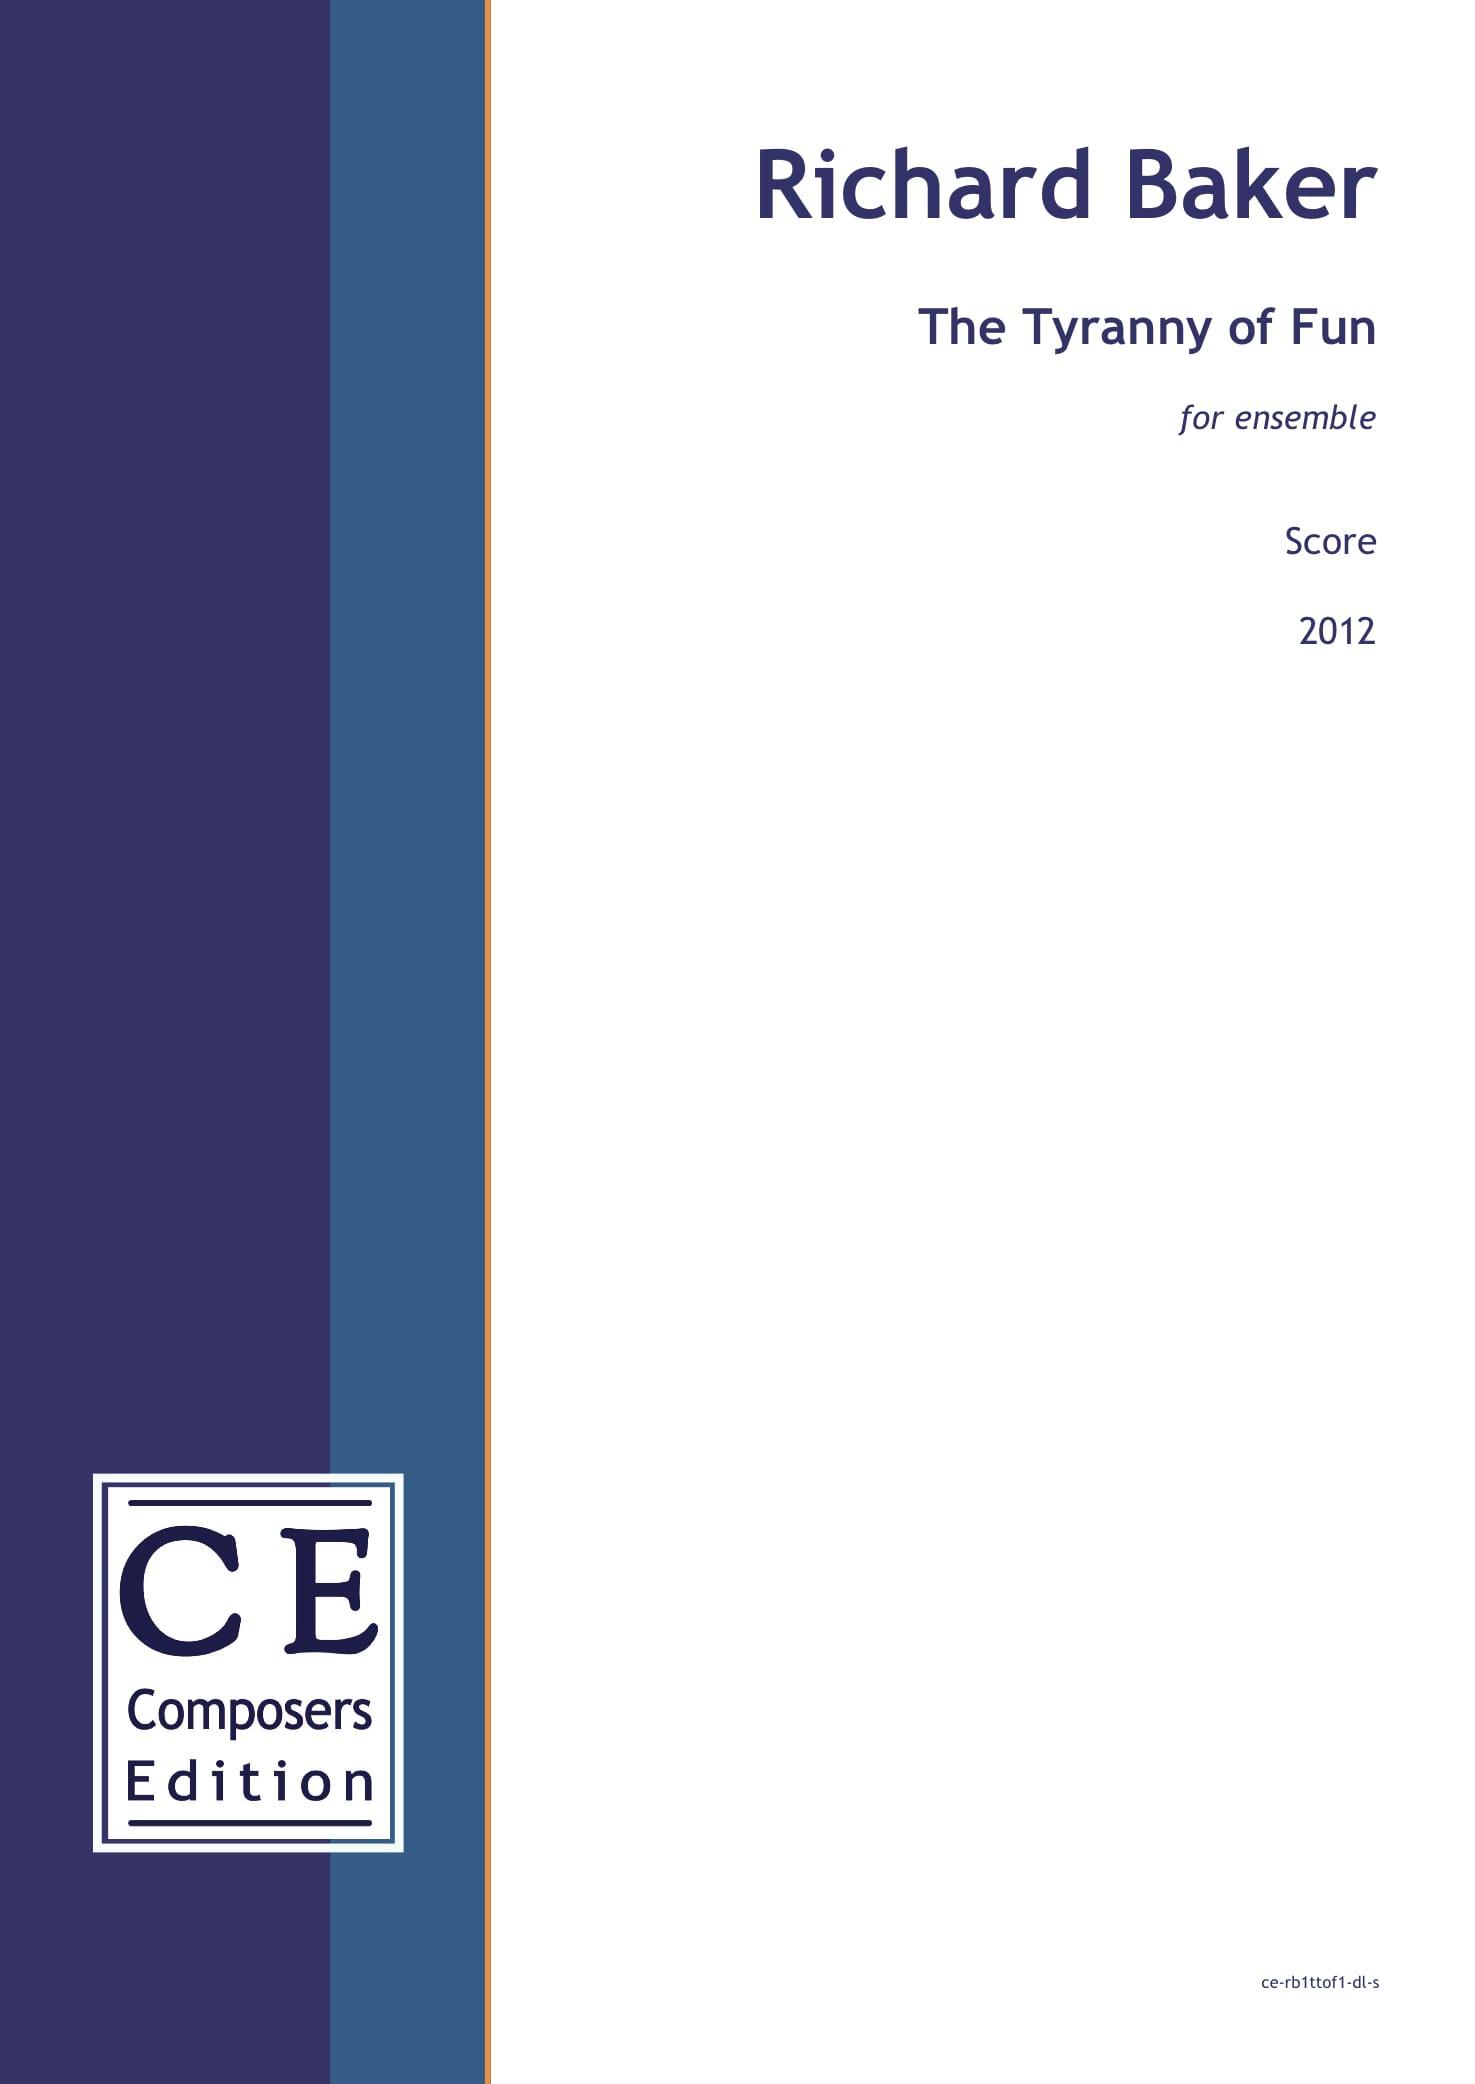 Richard Baker: The Tyranny of Fun for ensemble